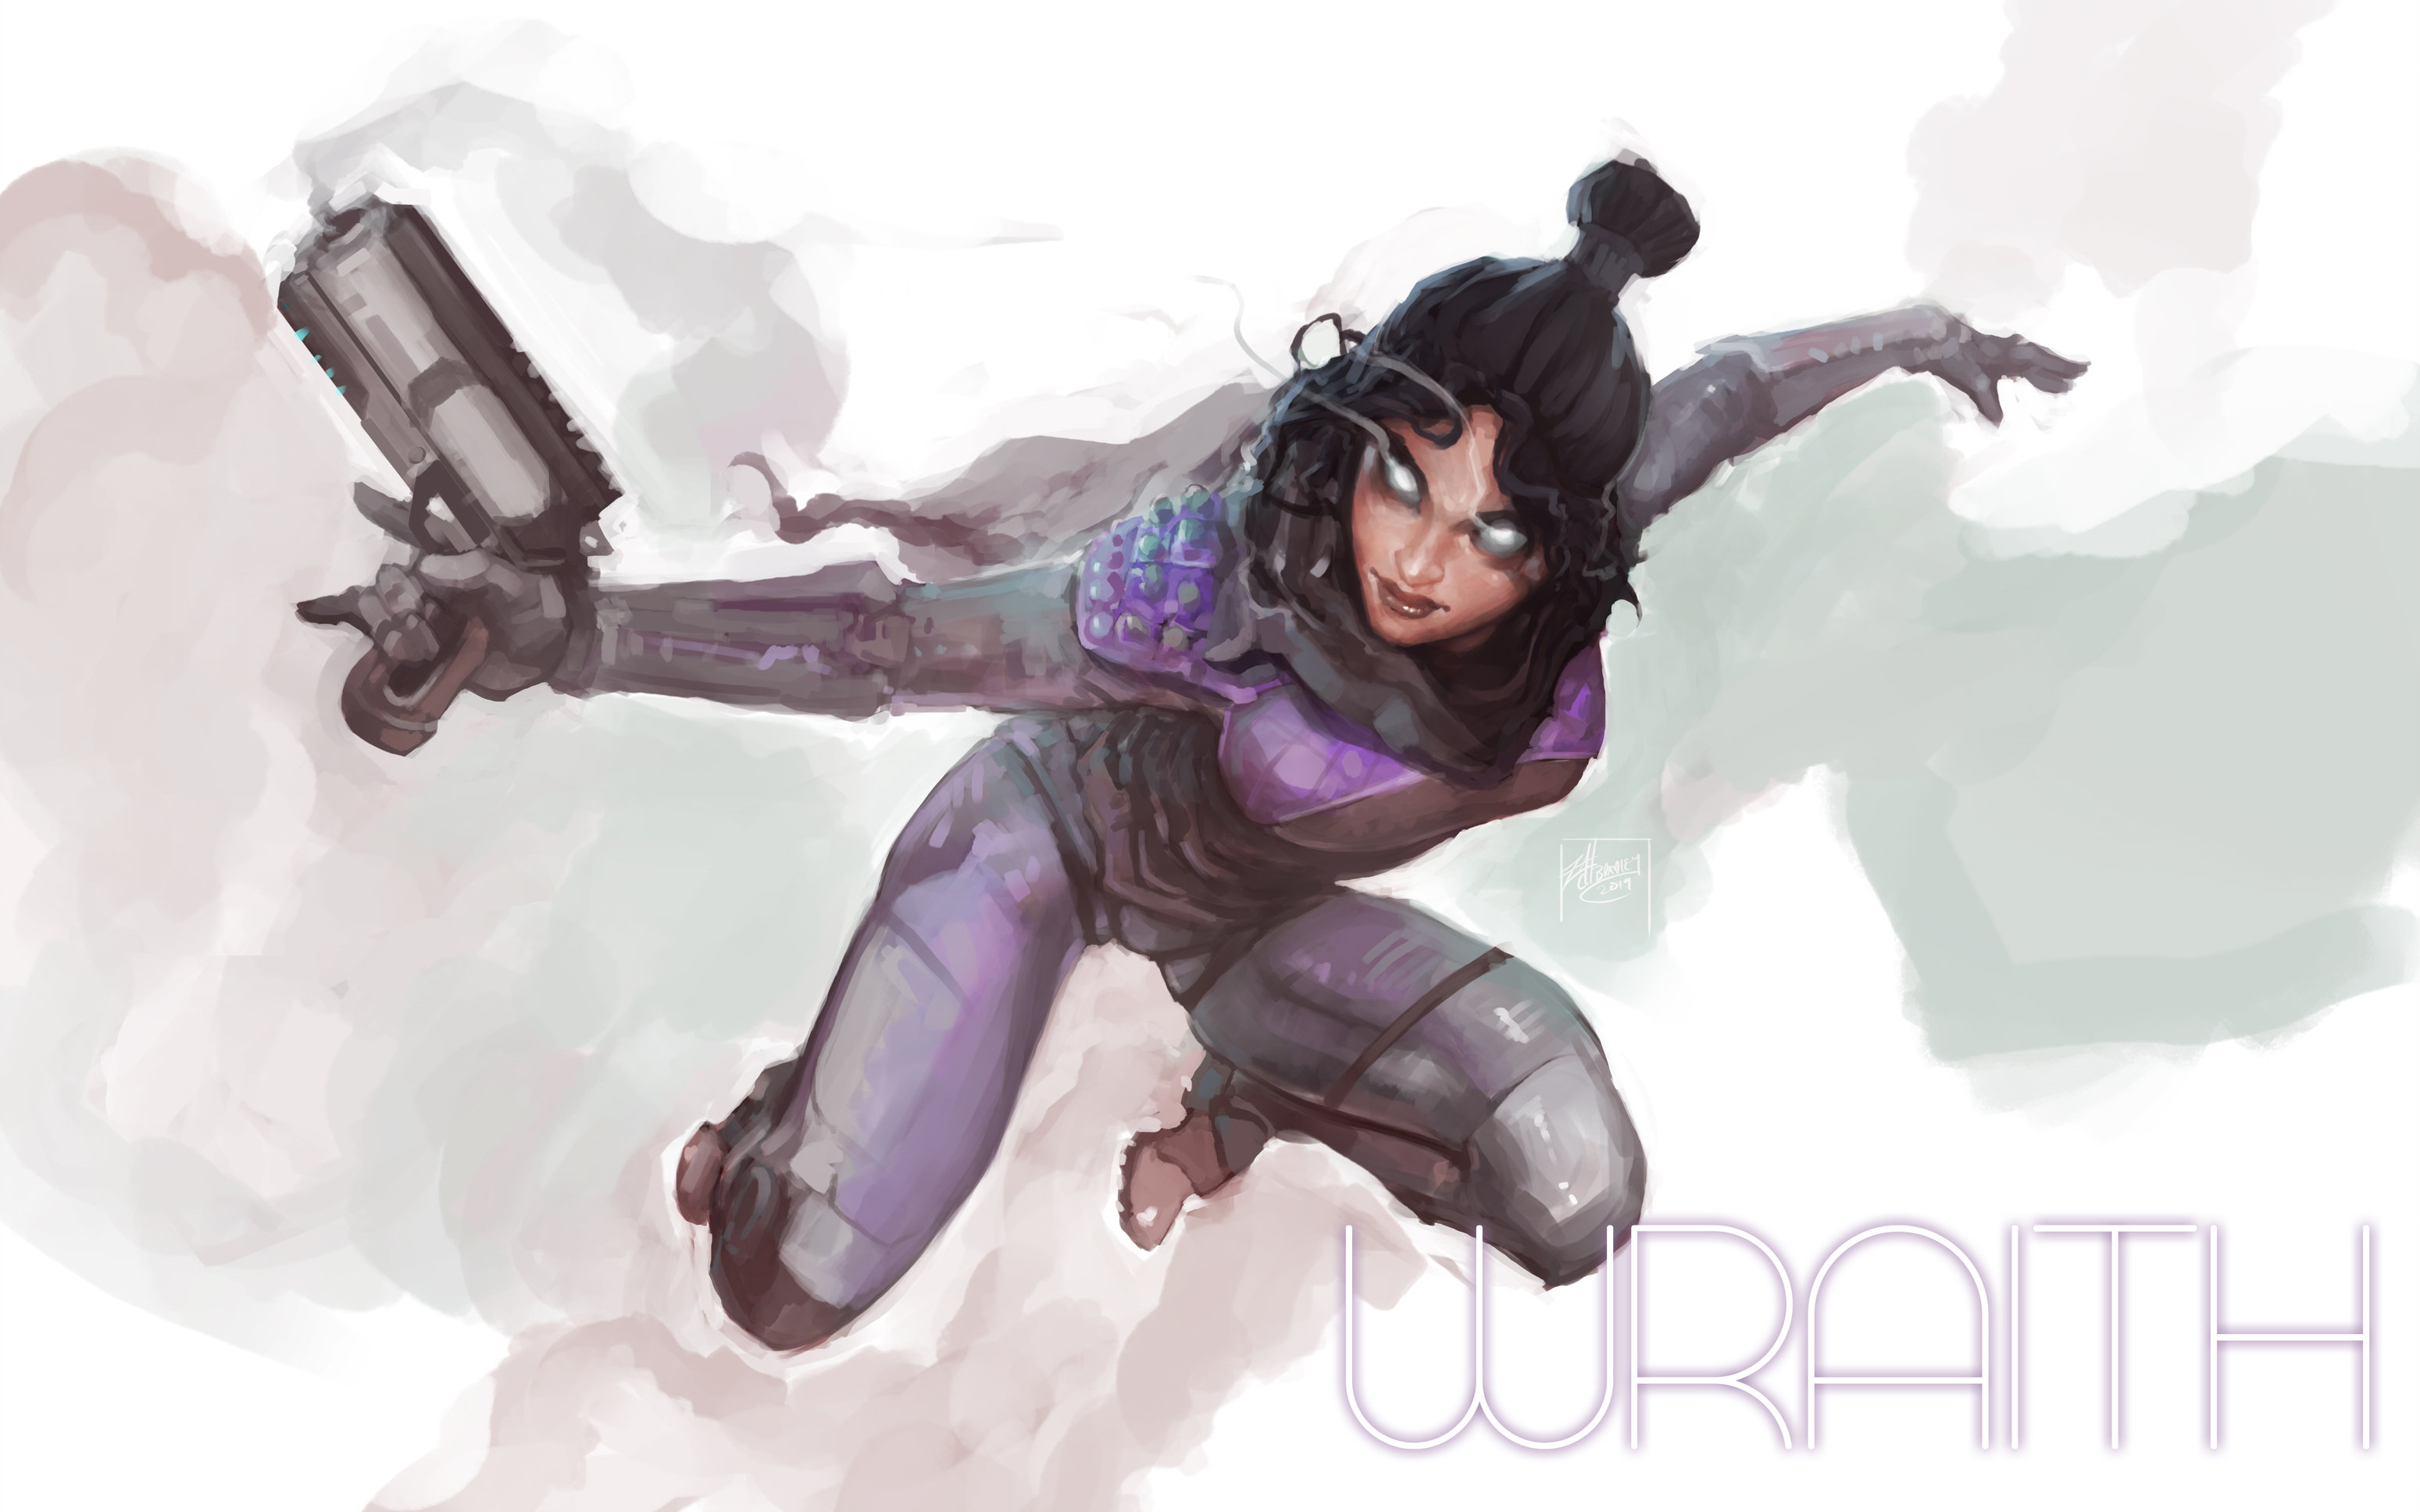 Wallpaper 4k Apex Legends Wraith Art 2019 Hd Apex Legends 4k